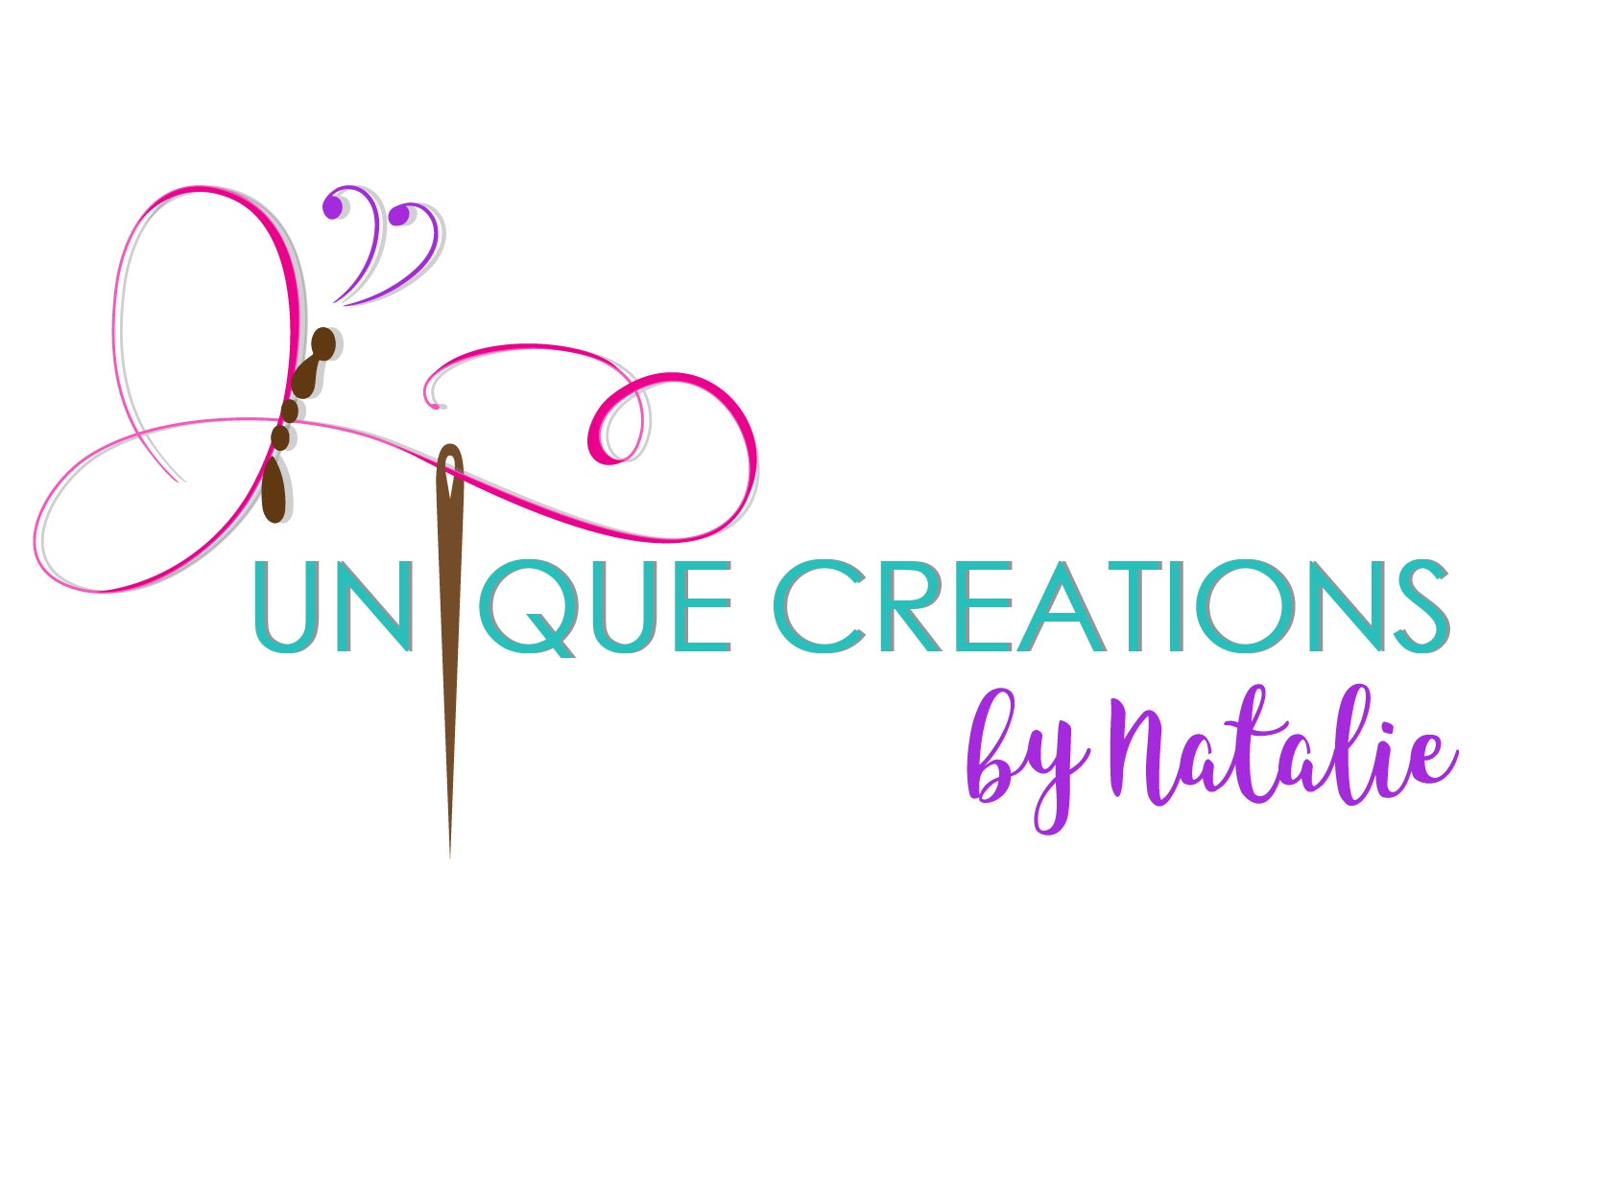 Unique Creations by Natalie